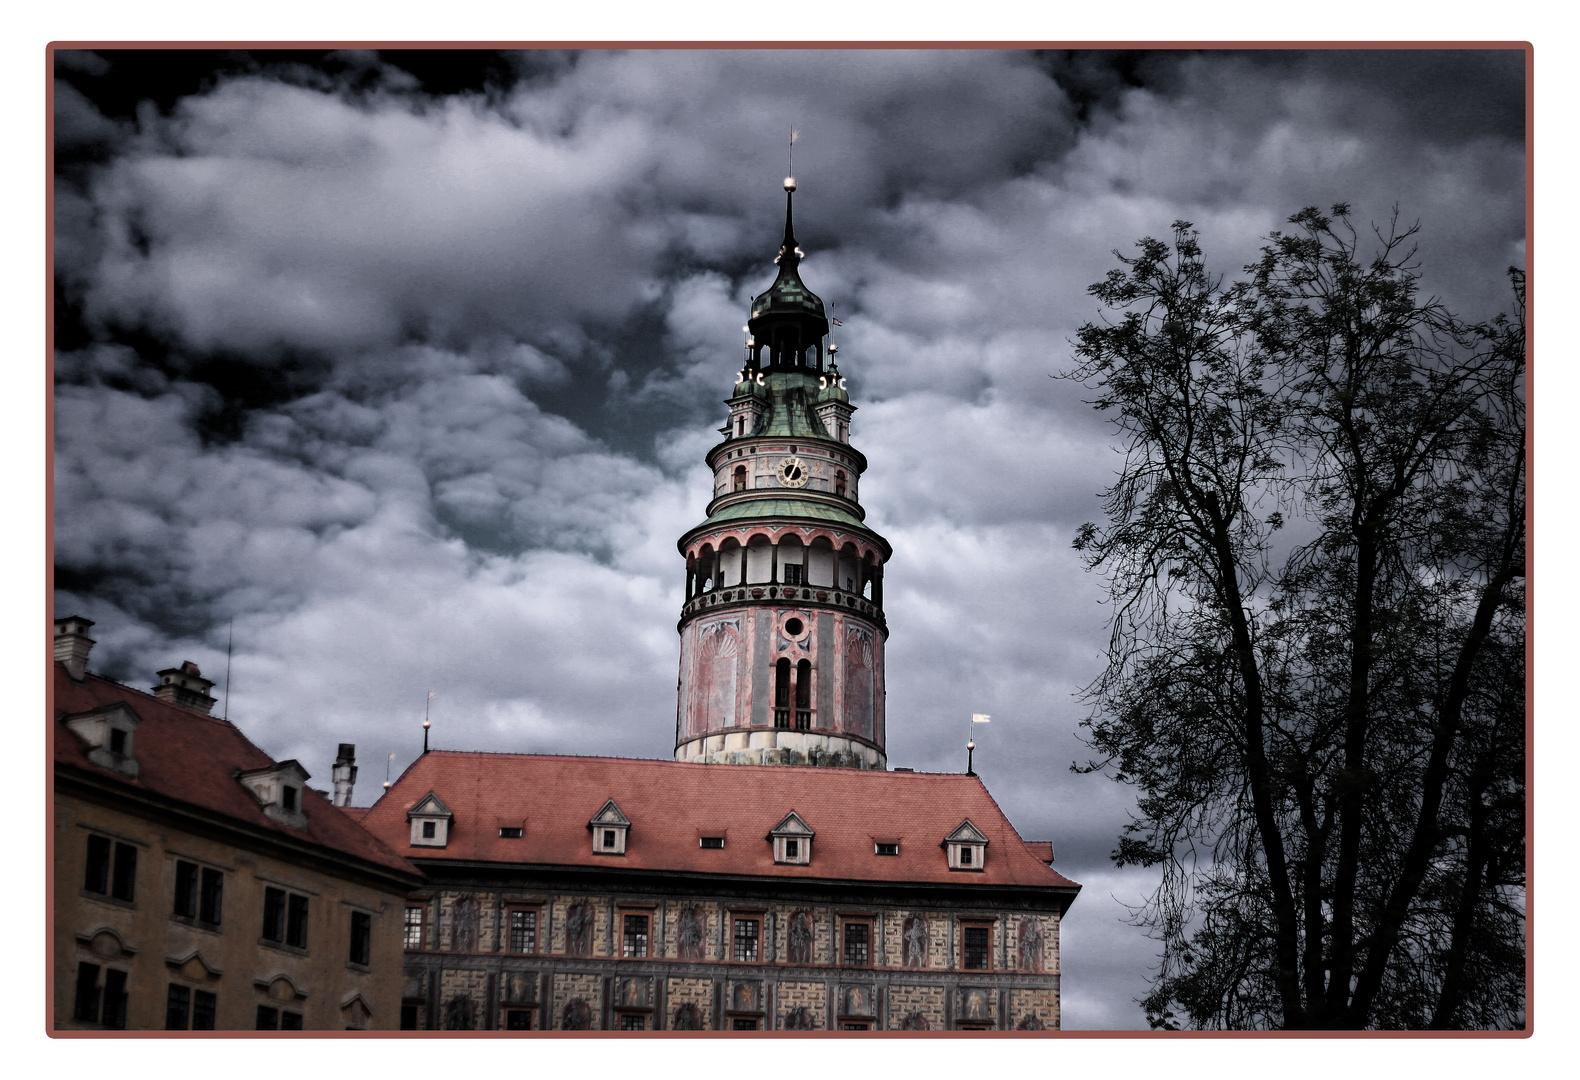 Krumau - Czech Republic